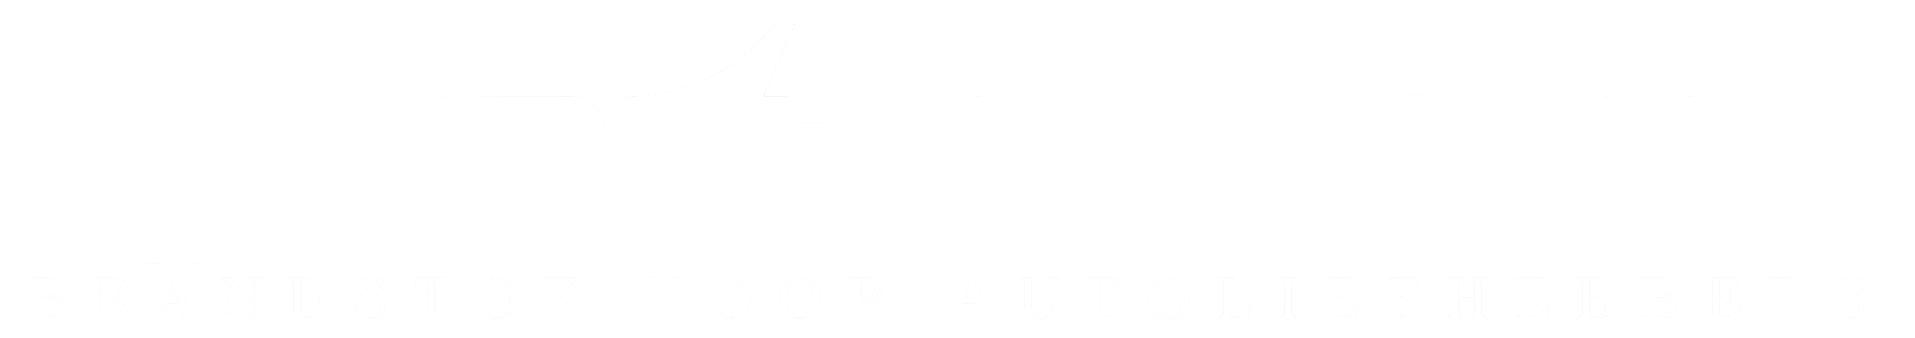 octanemagazine-shop